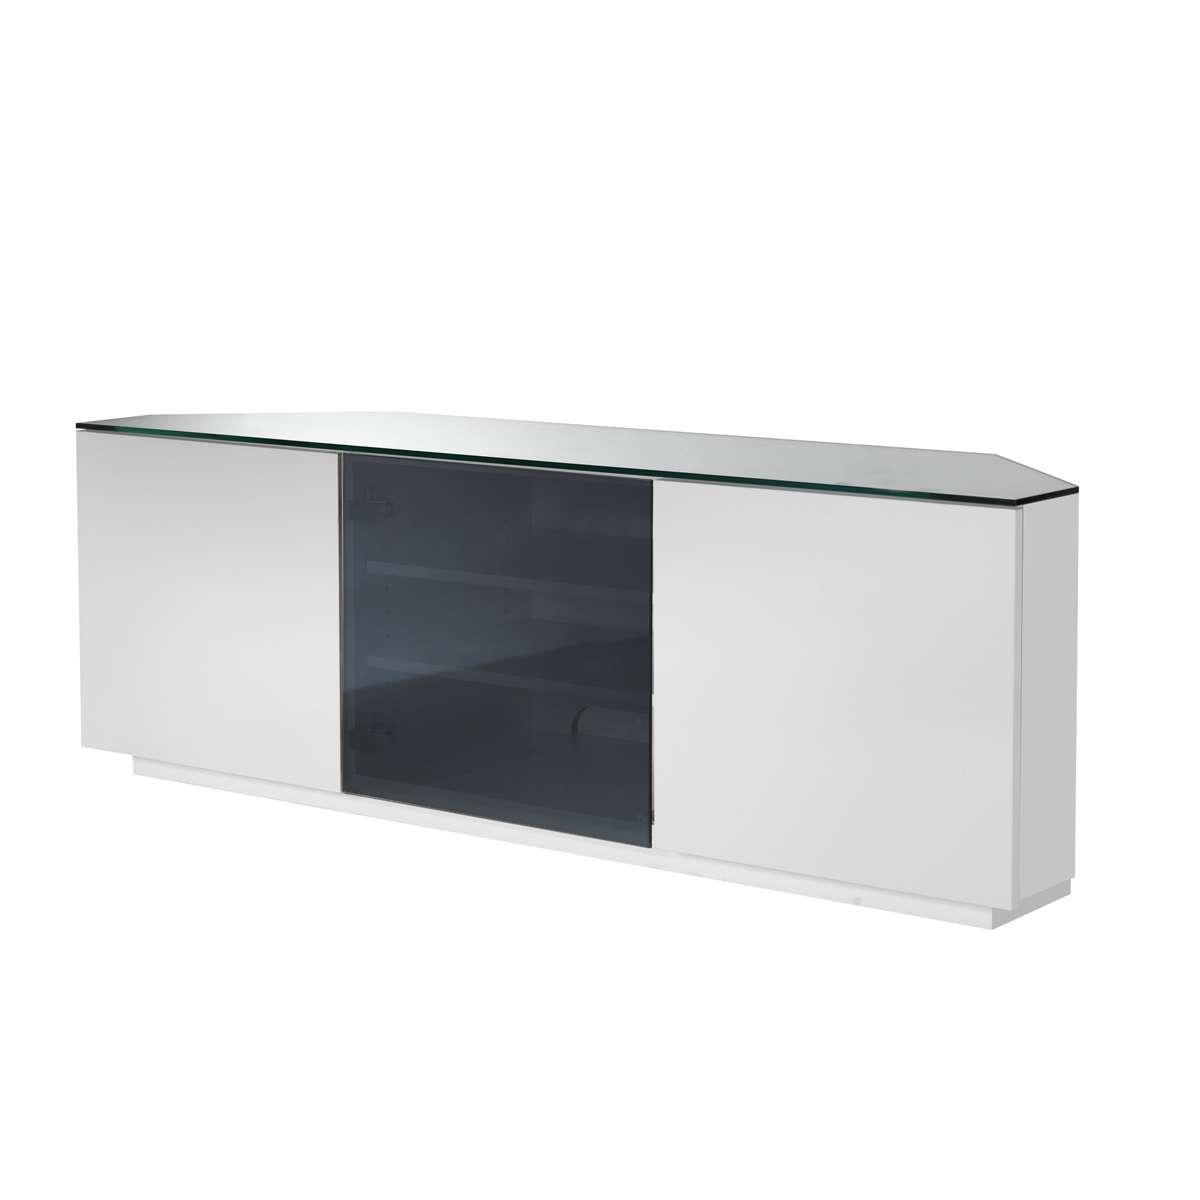 Ukcf Milan White Gloss & Black Glass Corner Tv Stand 150Cm For Black Gloss Corner Tv Stands (View 14 of 15)